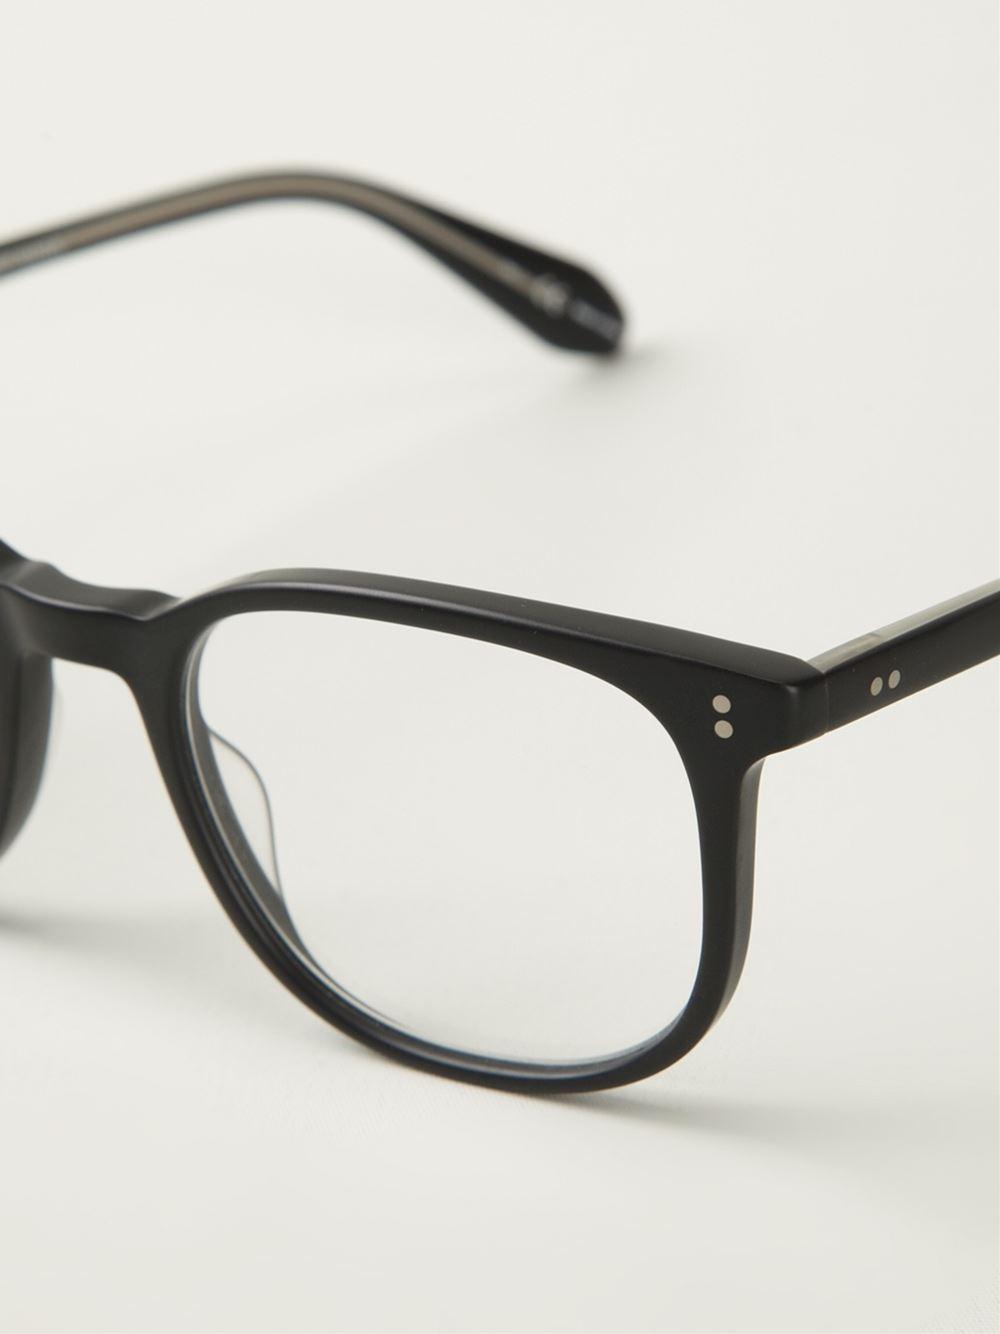 Garrett leight Bentley Optical Glasses in Black Lyst